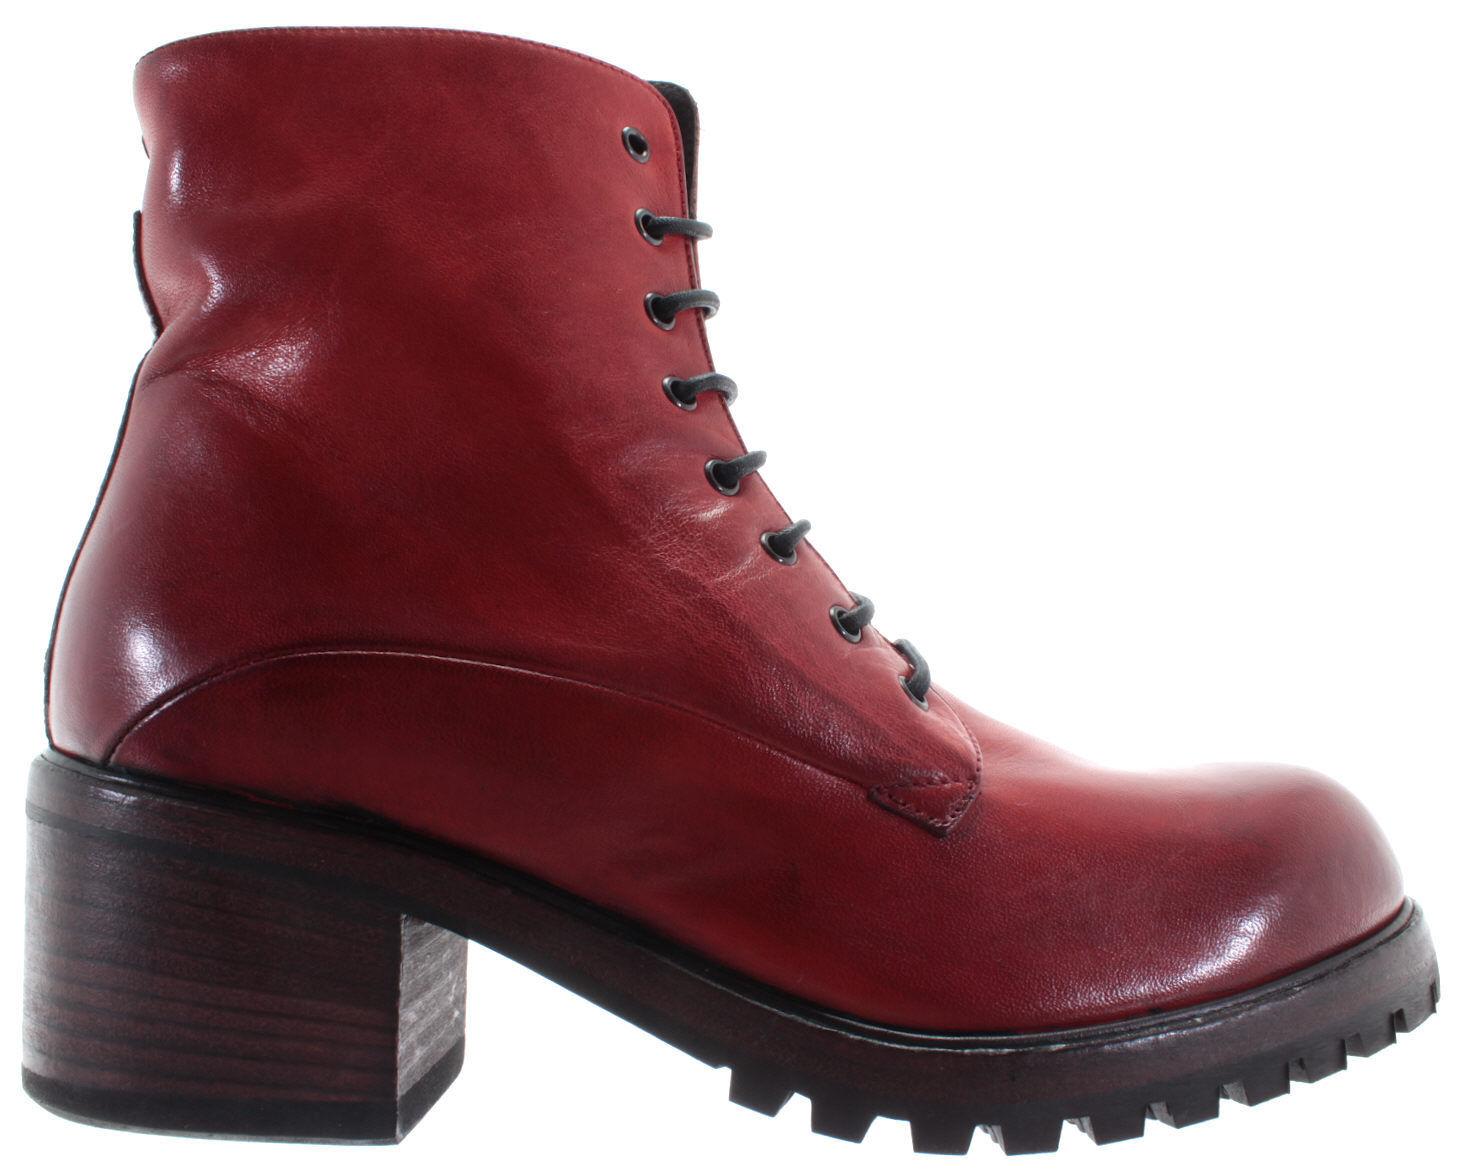 PANTANETTI zapatos mujer Ankle botas 11823H Nappa Horse Matton rojo Zip